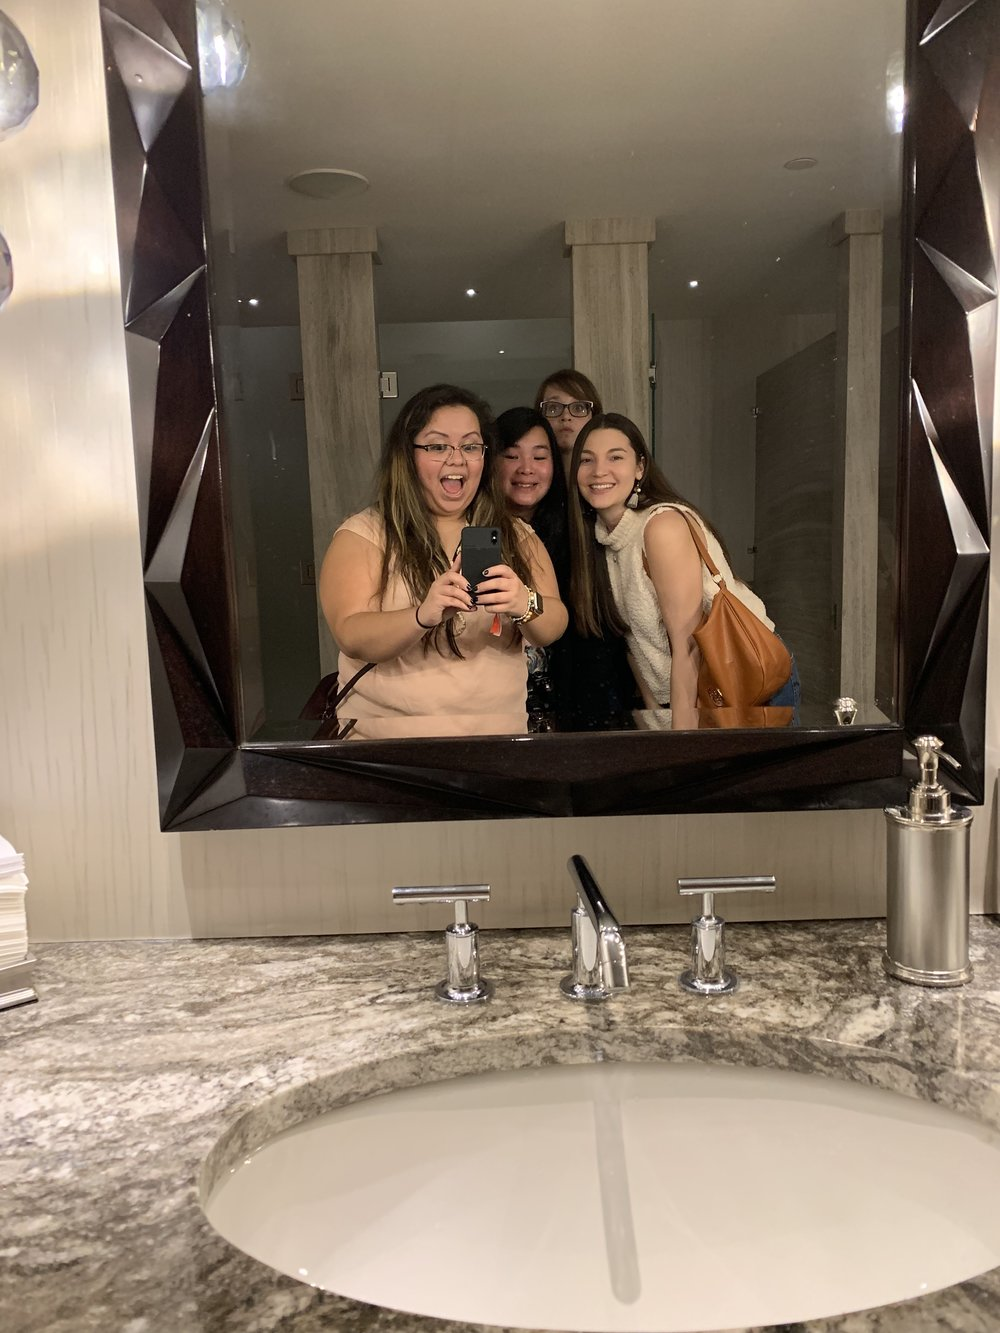 19 Instagrammable Bathrooms In San Antonio To Get That Perfect Selfie San Antonio Love List